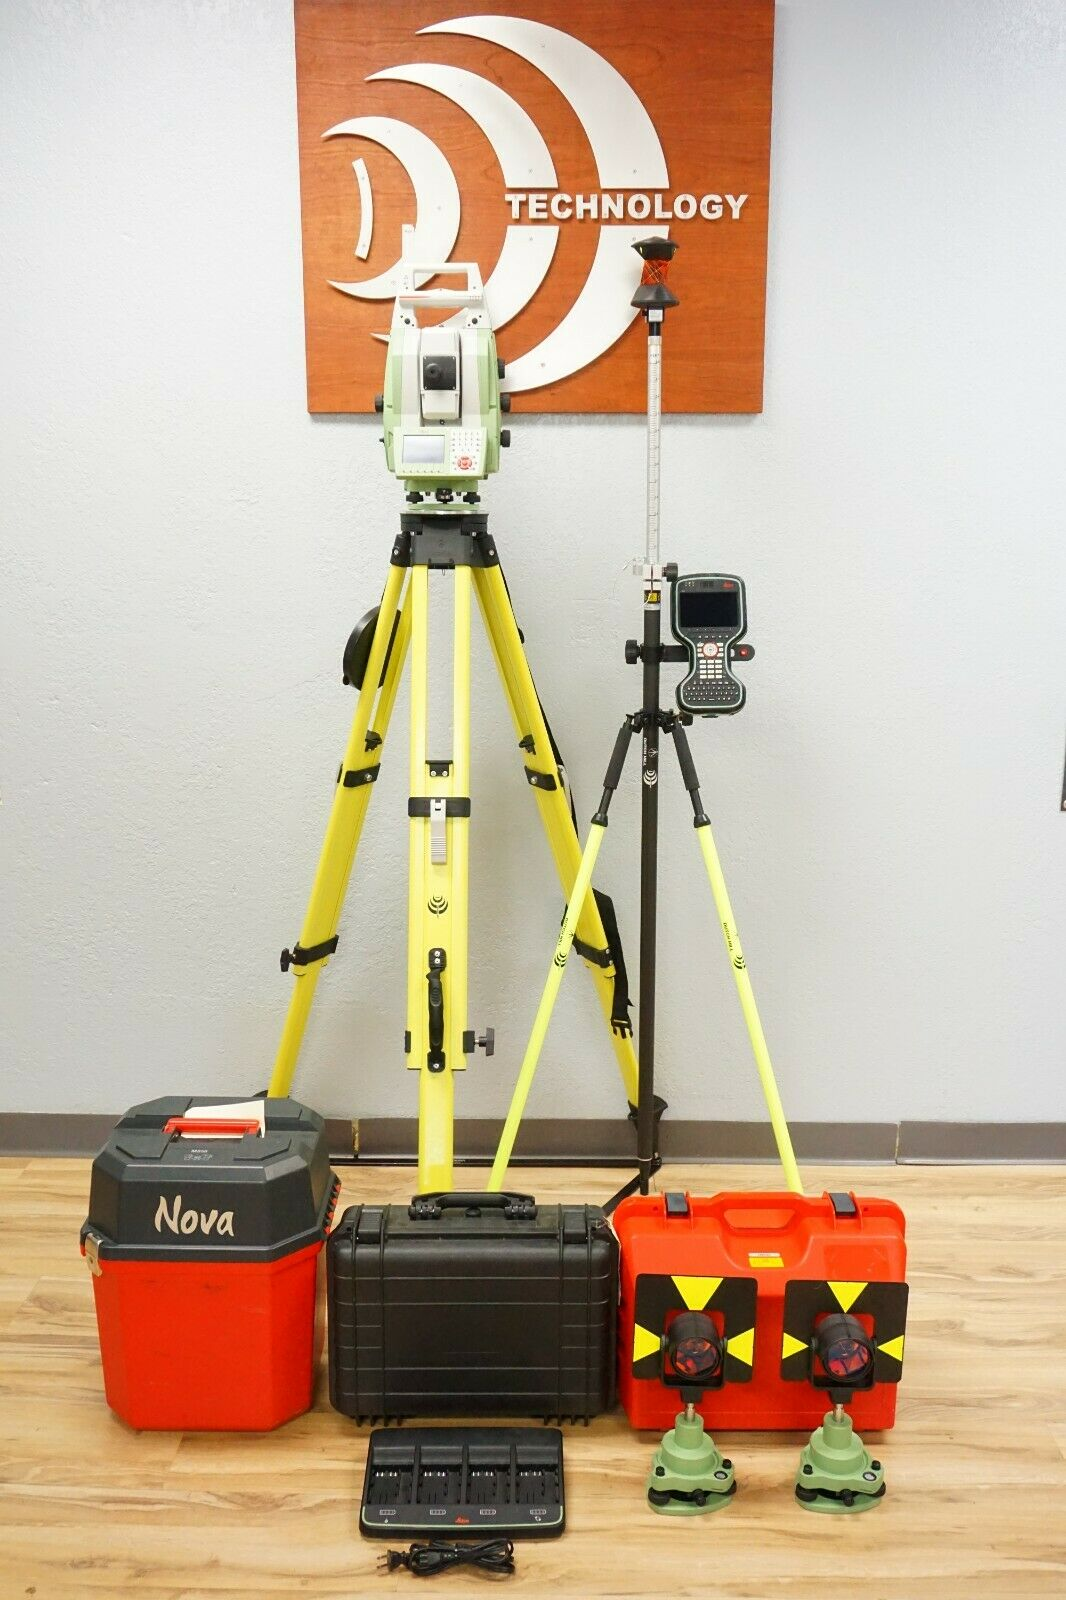 "Leica MS50 1"" R2000 NOVA Robotic Scanning Total Station Carlson Data Collector"